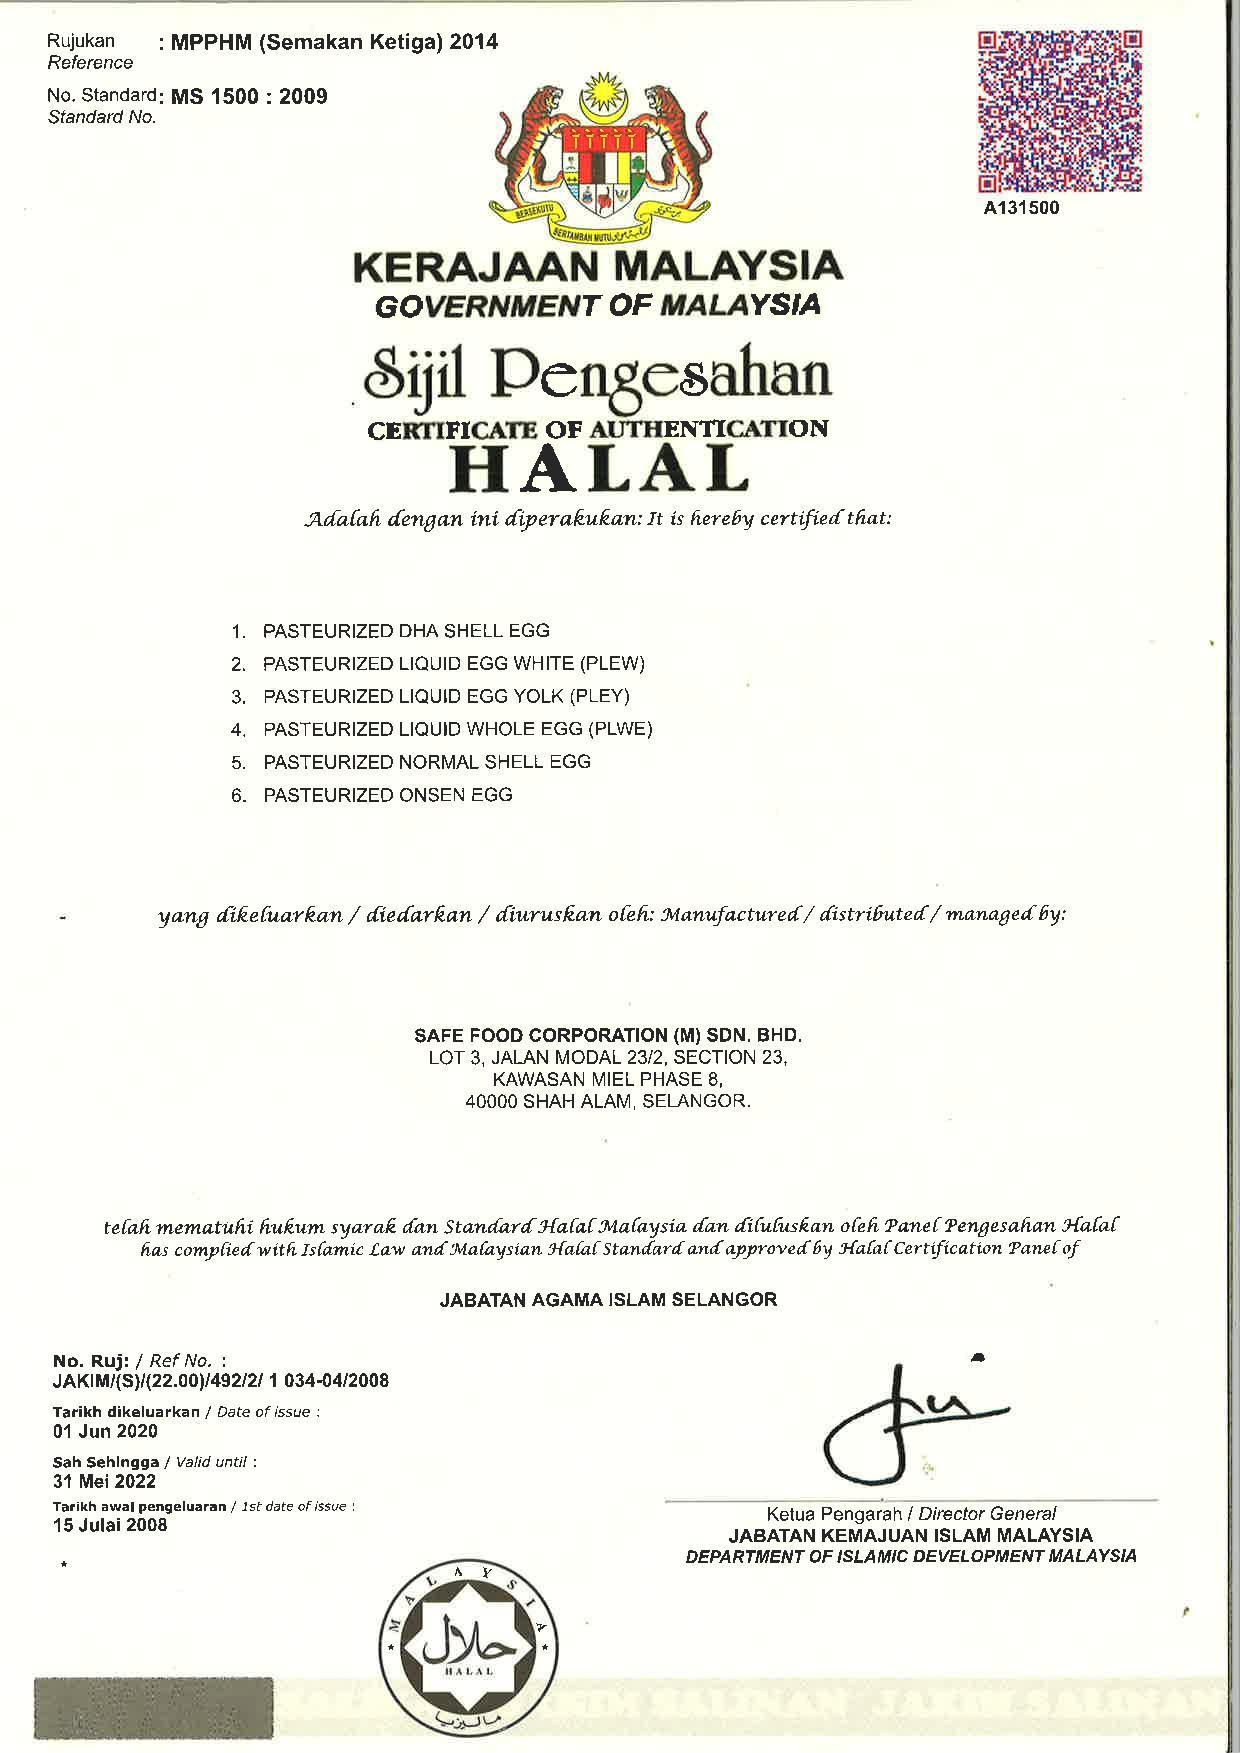 Halal Certificate 2022